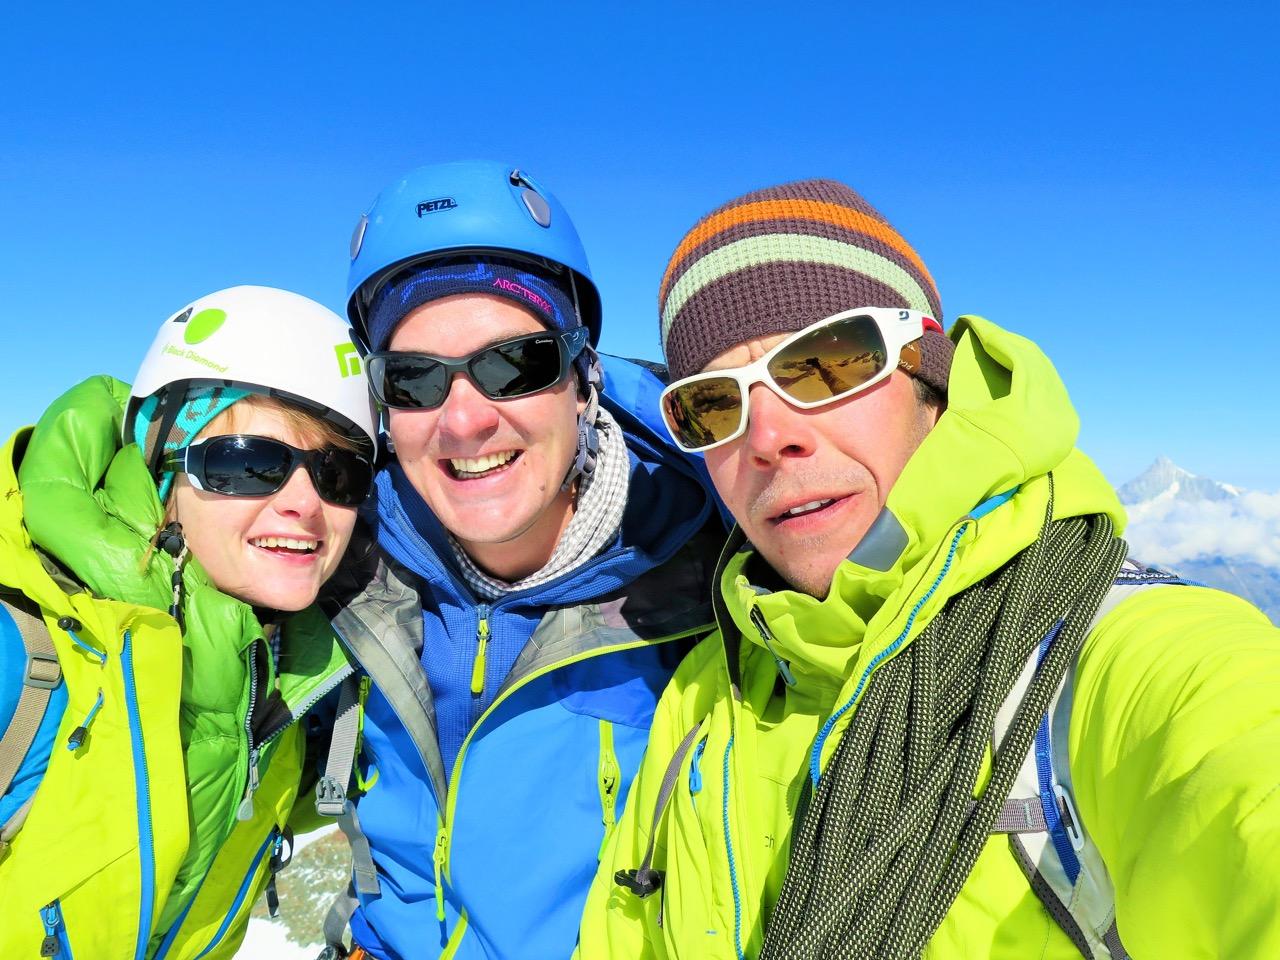 klassisches Gipfel-Selfie auf dem Castor 4228m - unverblühmte Lebensfreude!